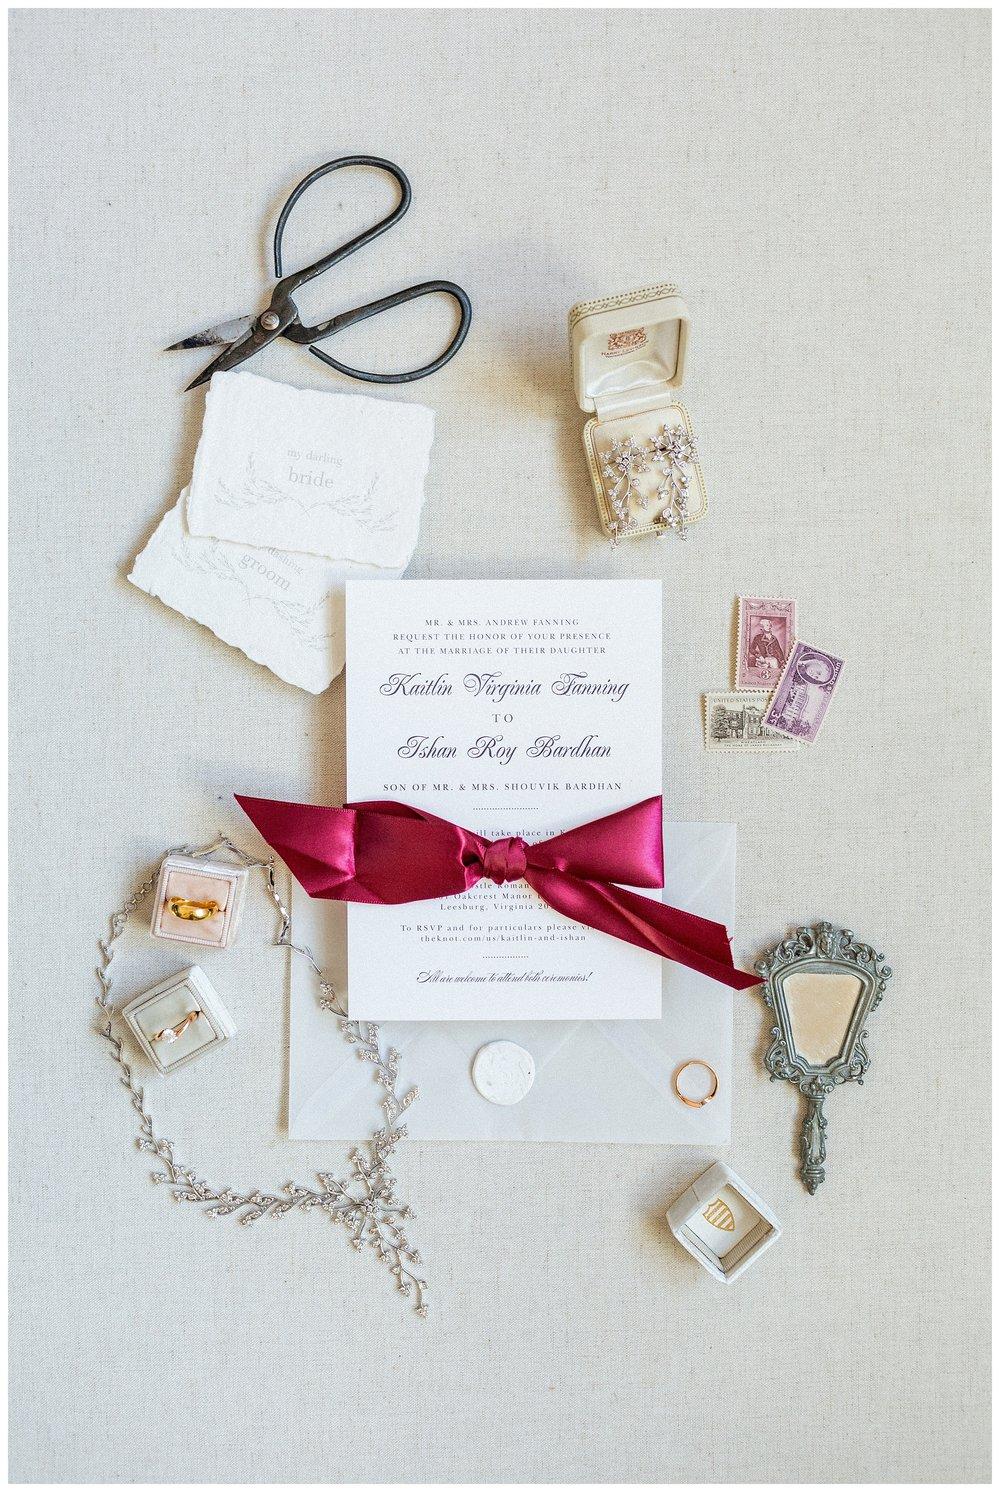 Stone Tower Winery Wedding | Virginia Winter Wedding | VA Wedding Photographer Kir Tuben_0007.jpg